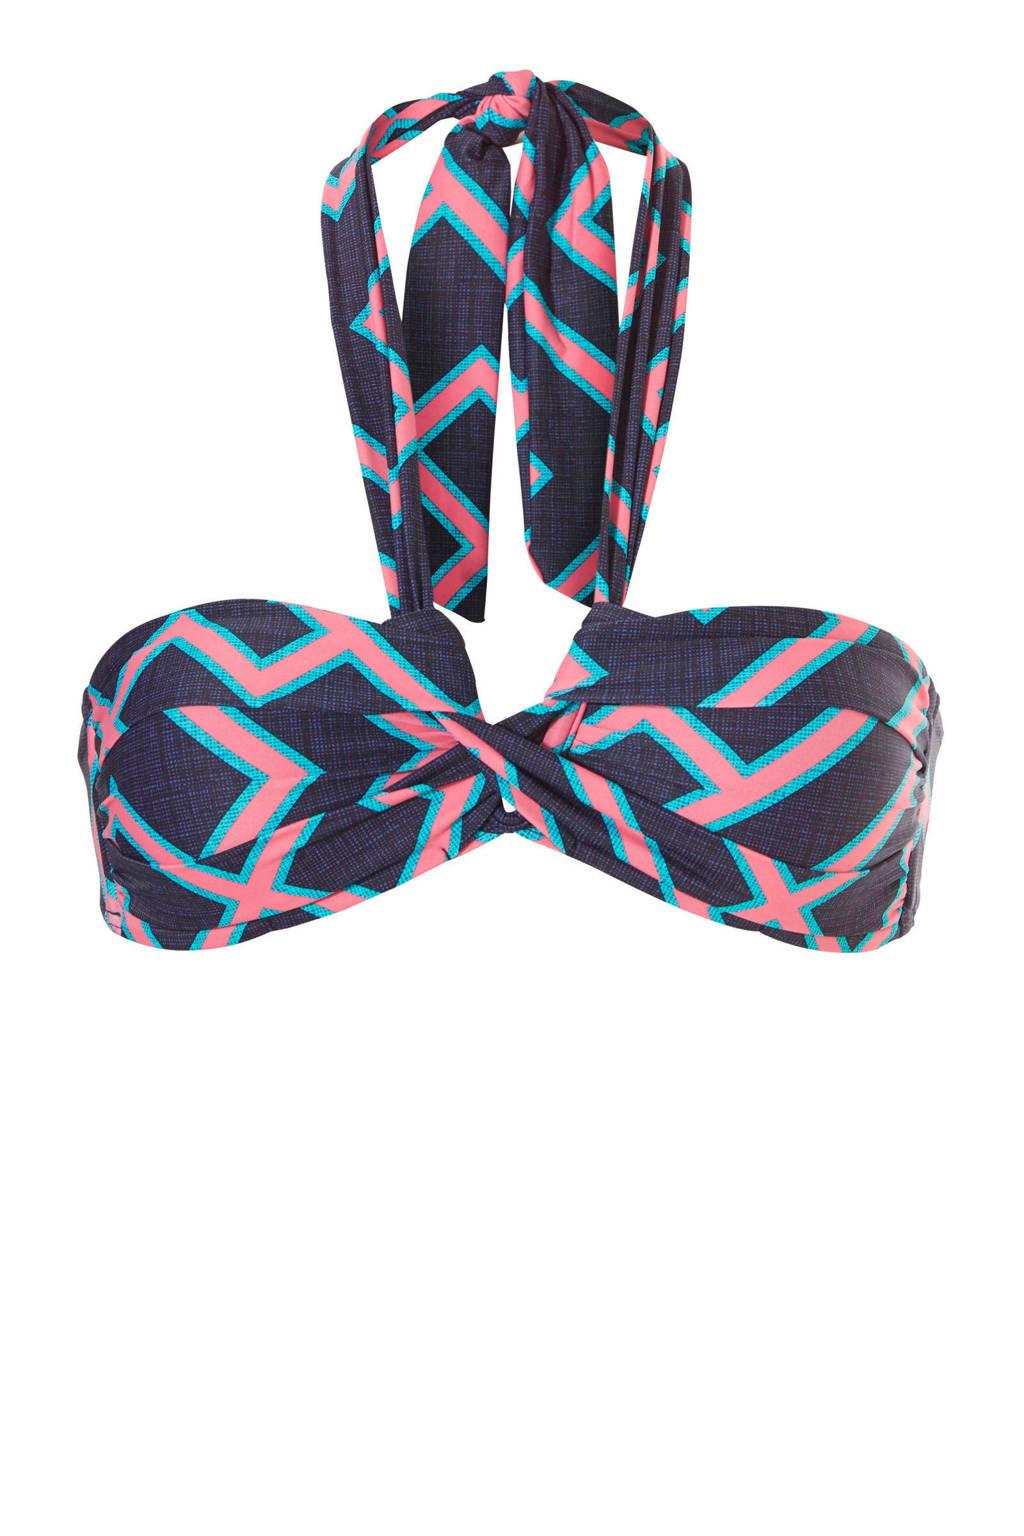 TC WOW bandeau bikinitop met all-over print, Marine/roze